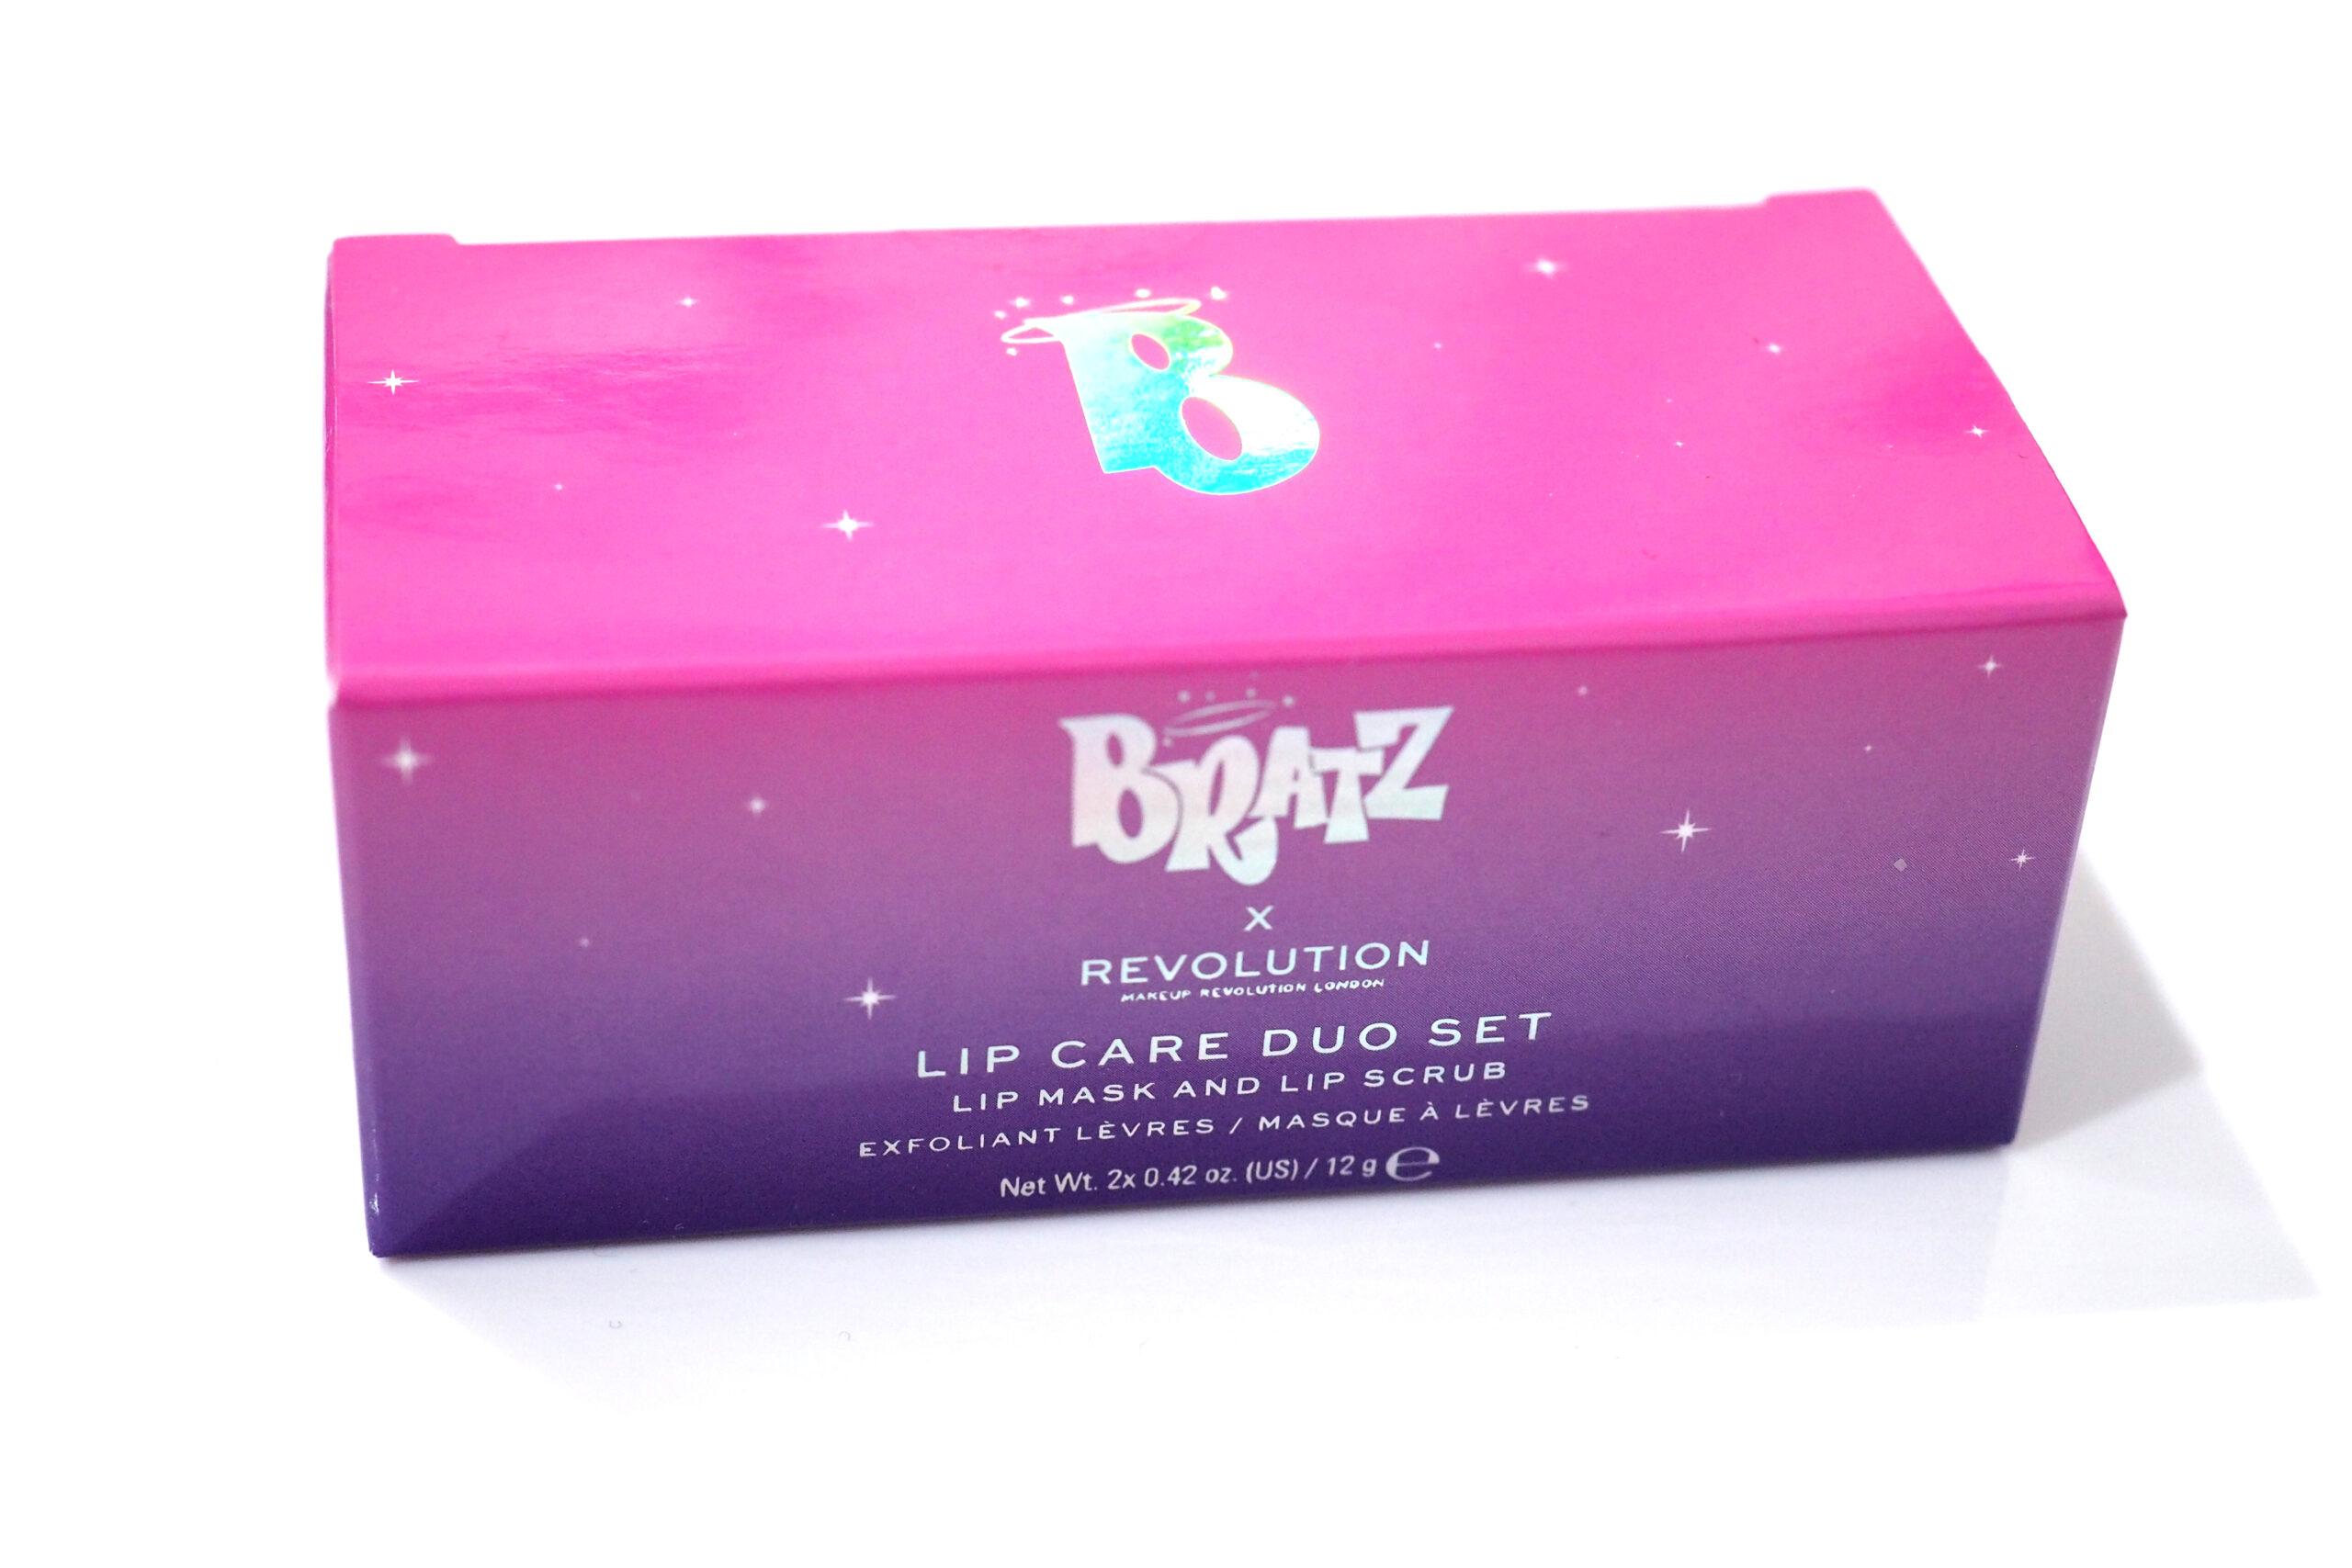 Revolution x Bratz Lip Care Duo Set Review